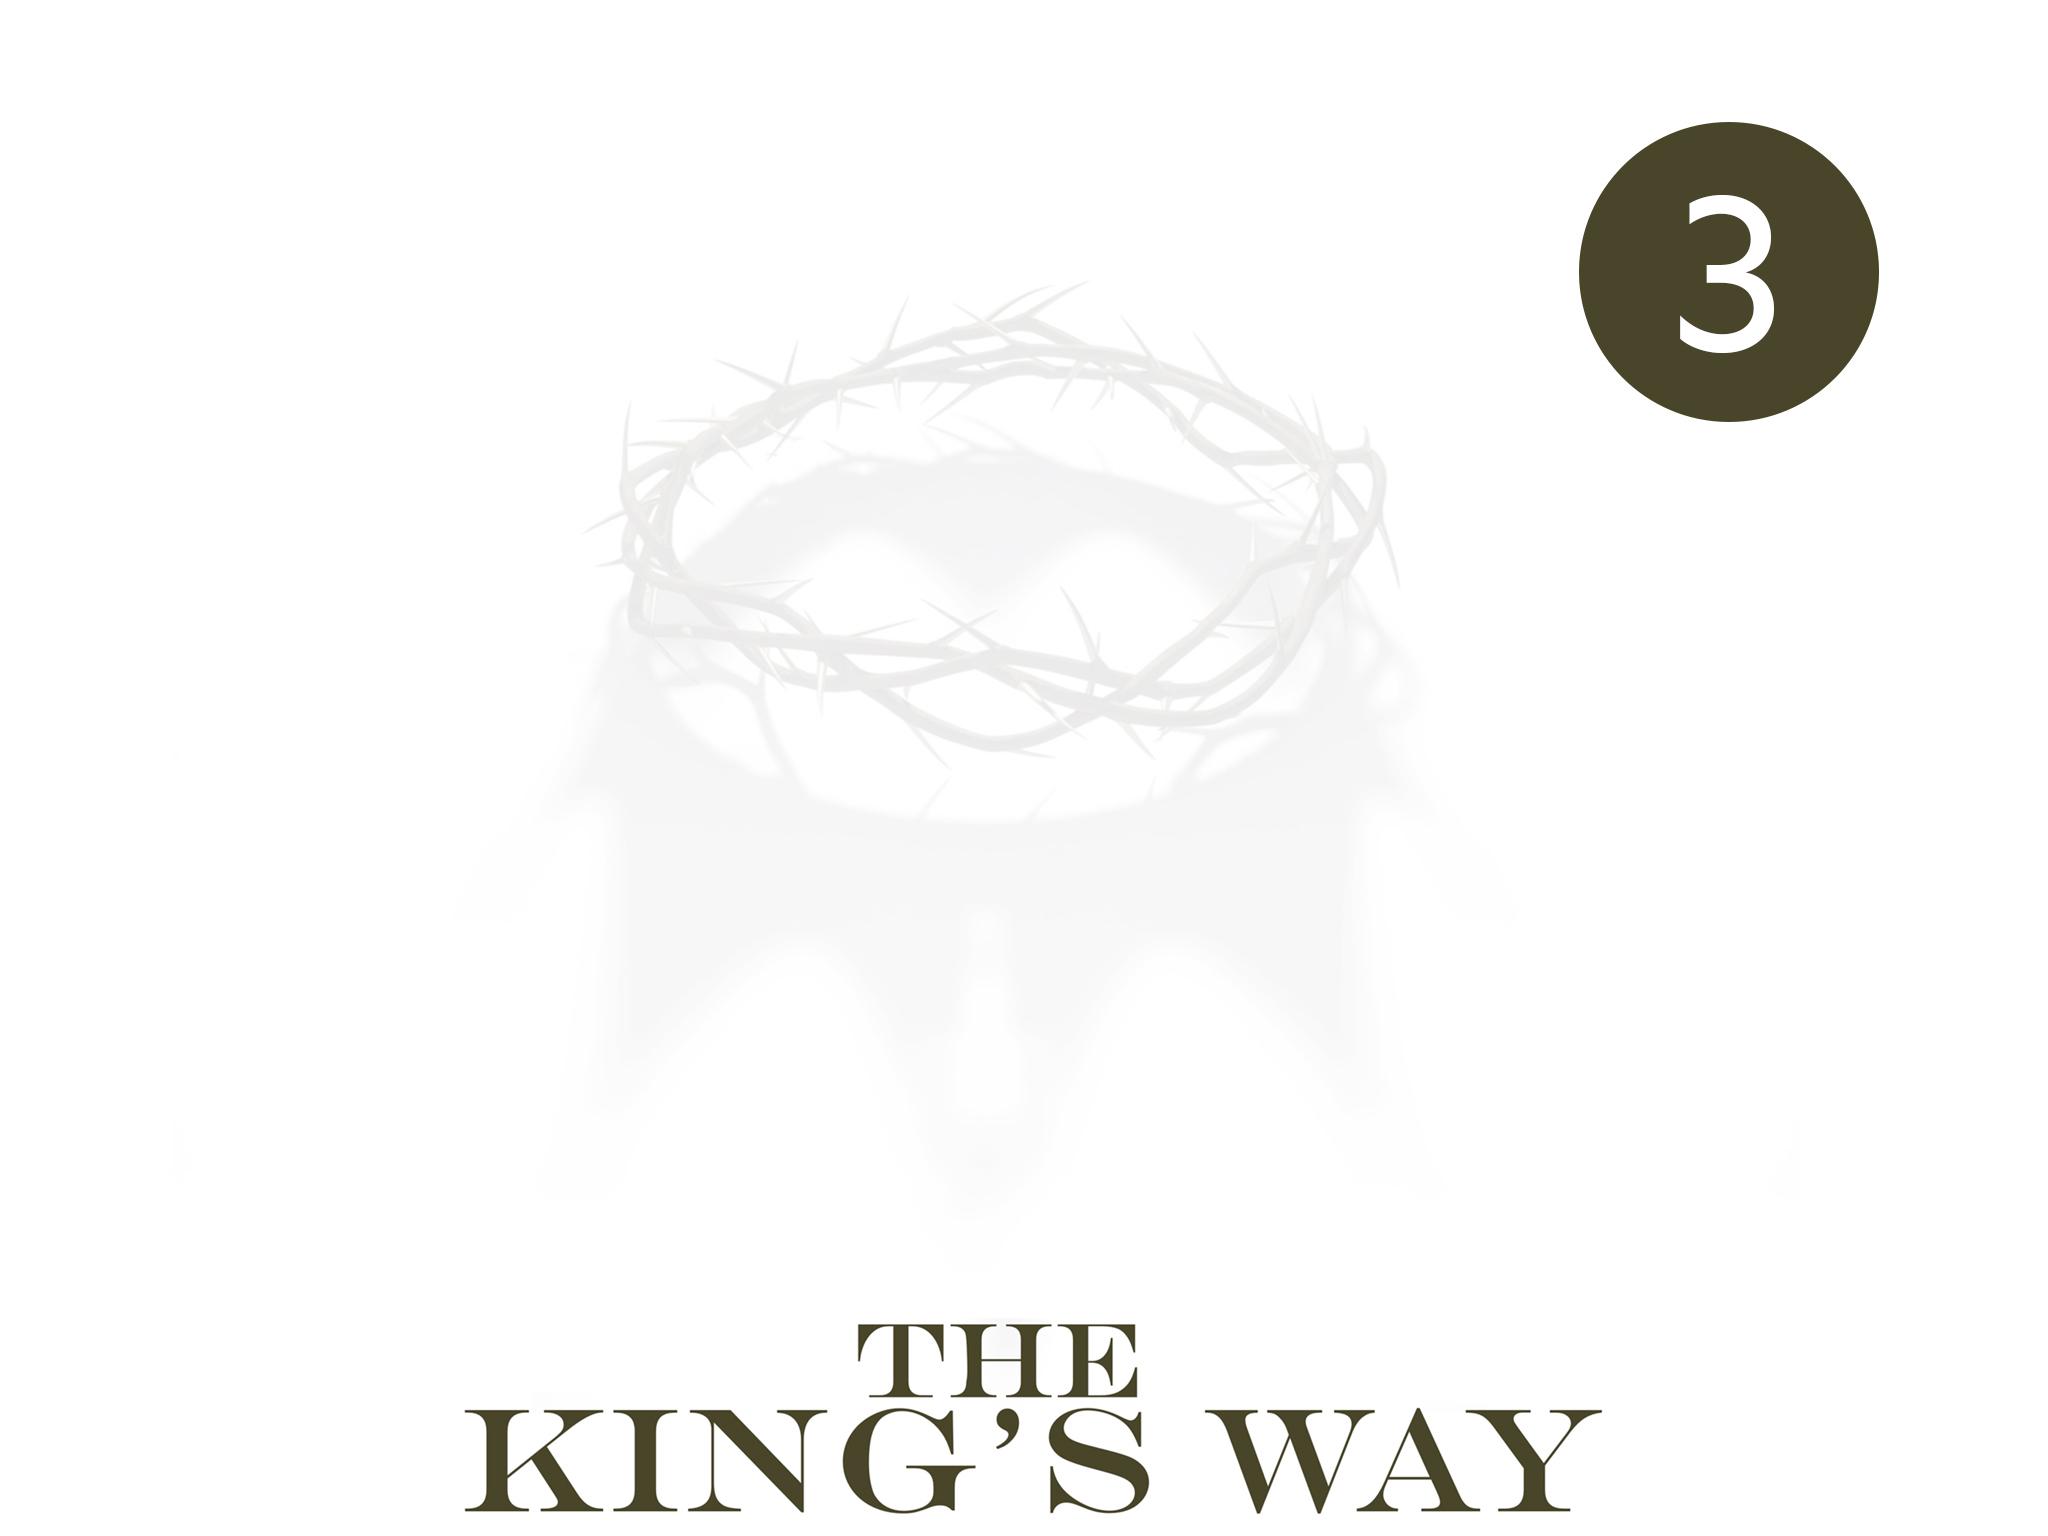 Kings way 3 sermon thumb.jpg